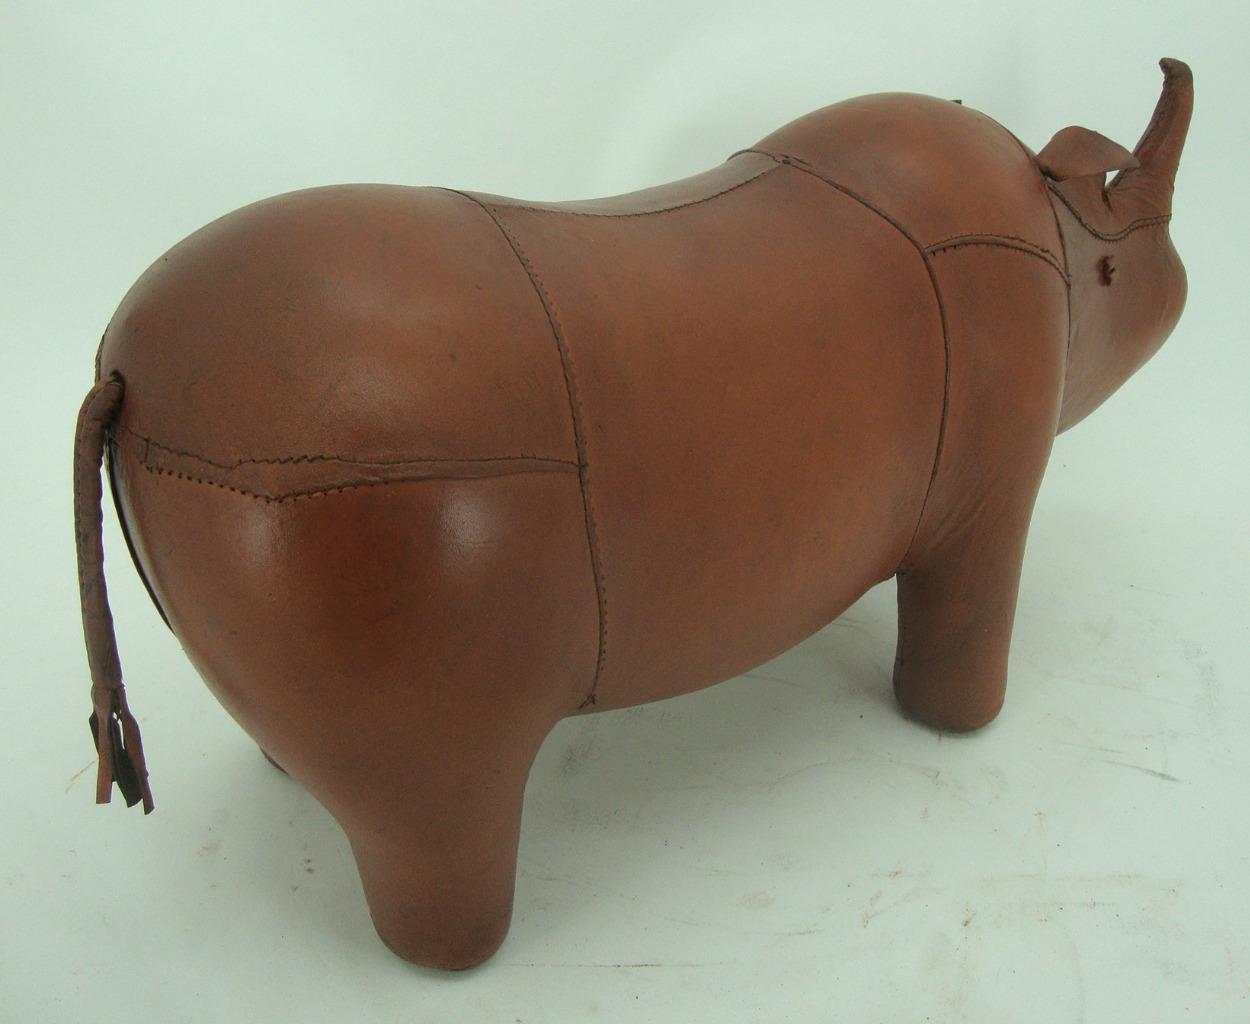 Hecho-a-Mano-Cuero-Genuino-Rhino-Taburete-Reposapies-28cm-X-56cm miniatura 6